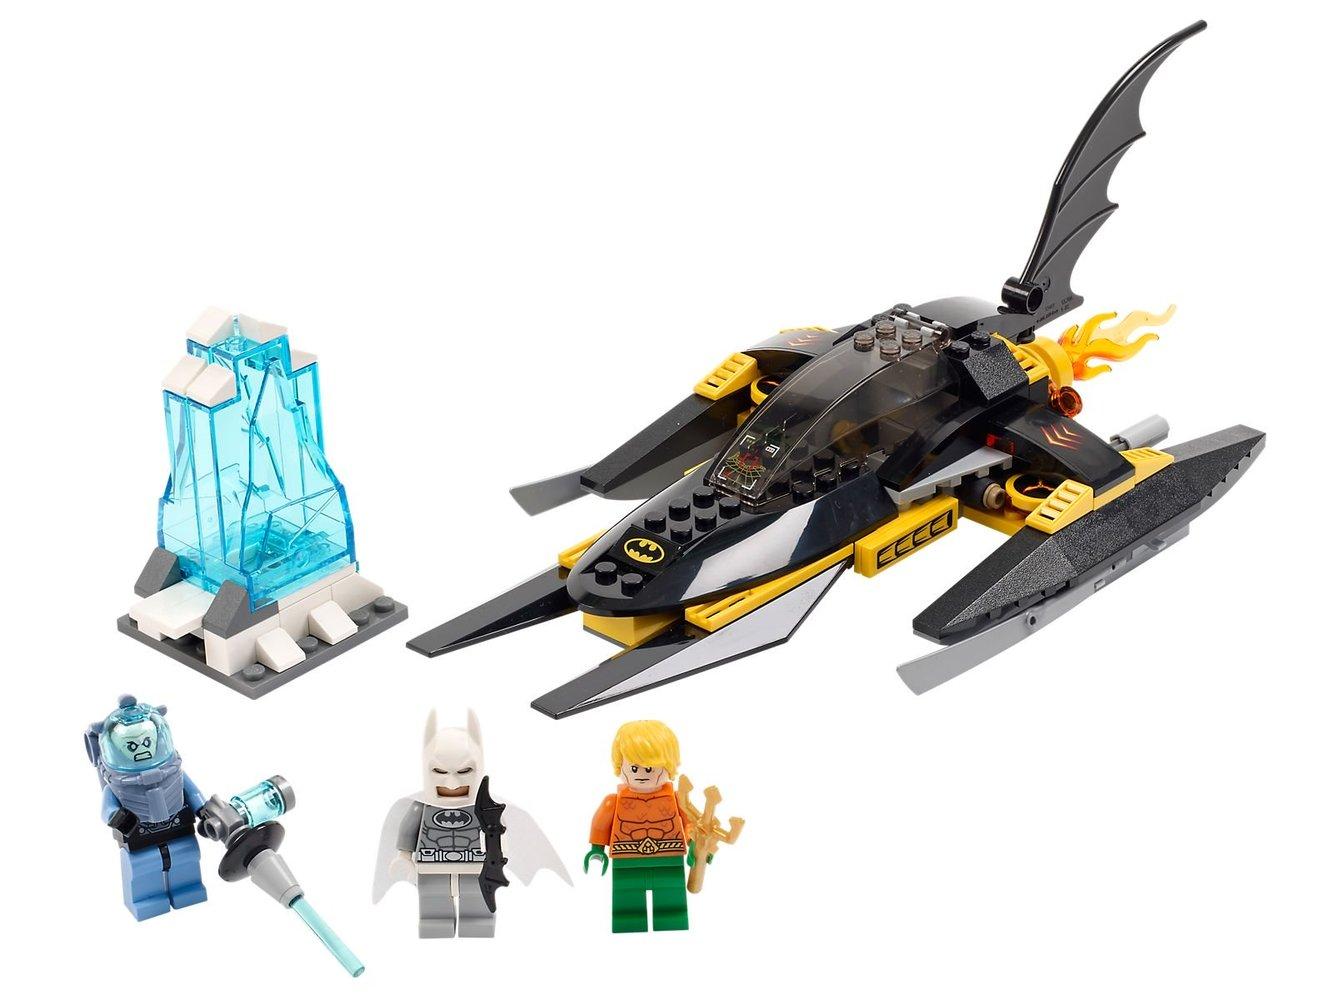 Arctic Batman vs. Mr. Freeze: Aquaman on Ice